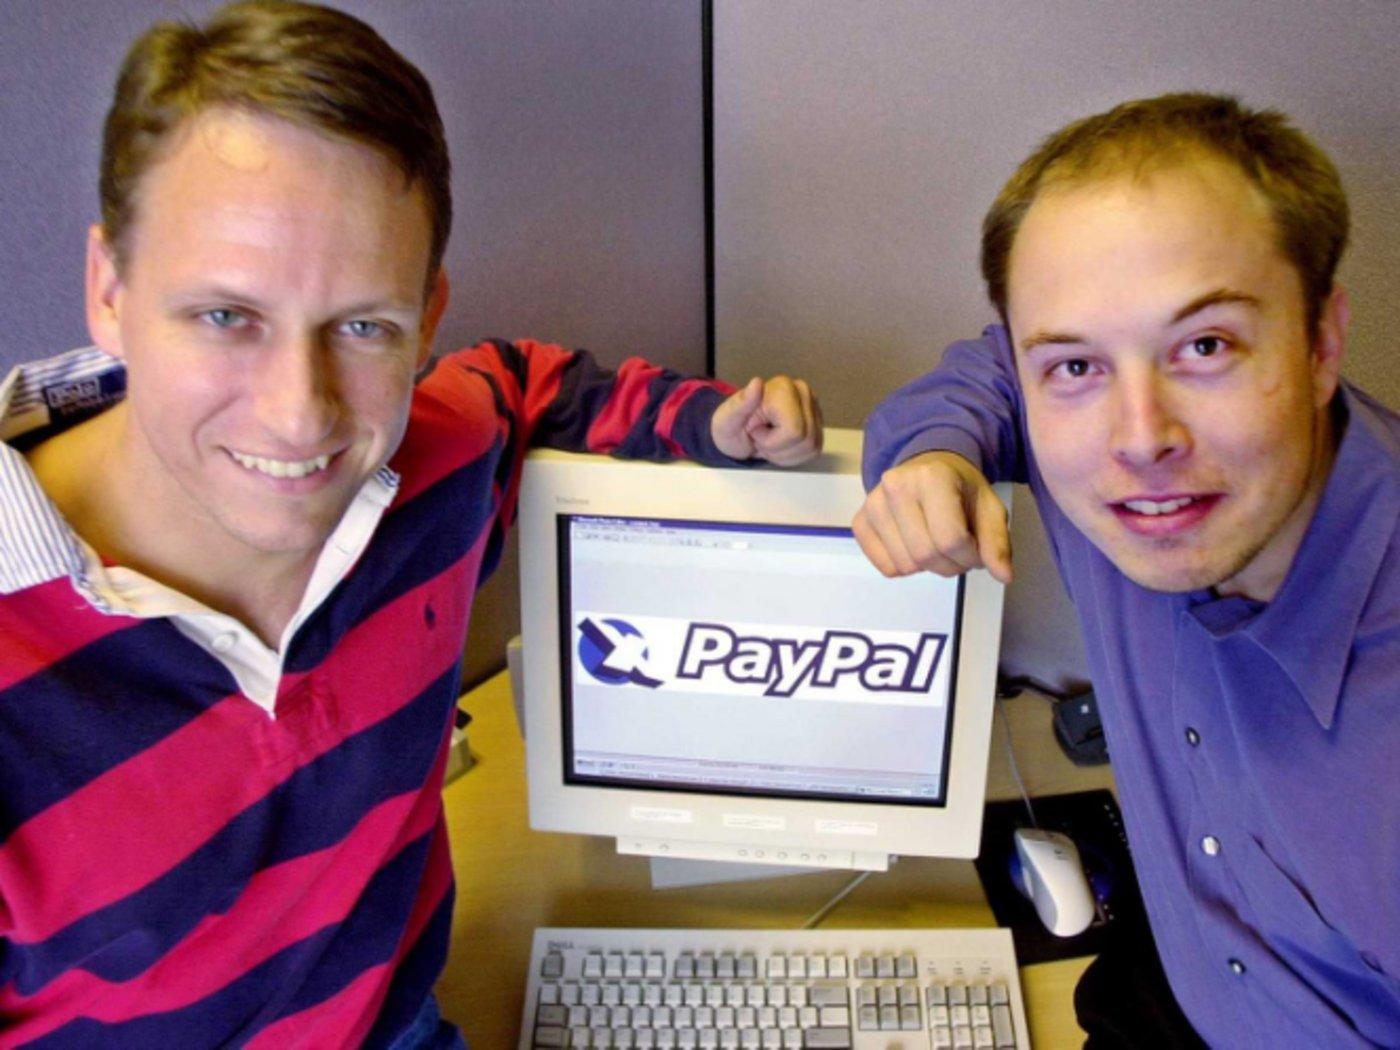 PayPal创始人之一的彼得·蒂尔与马斯克